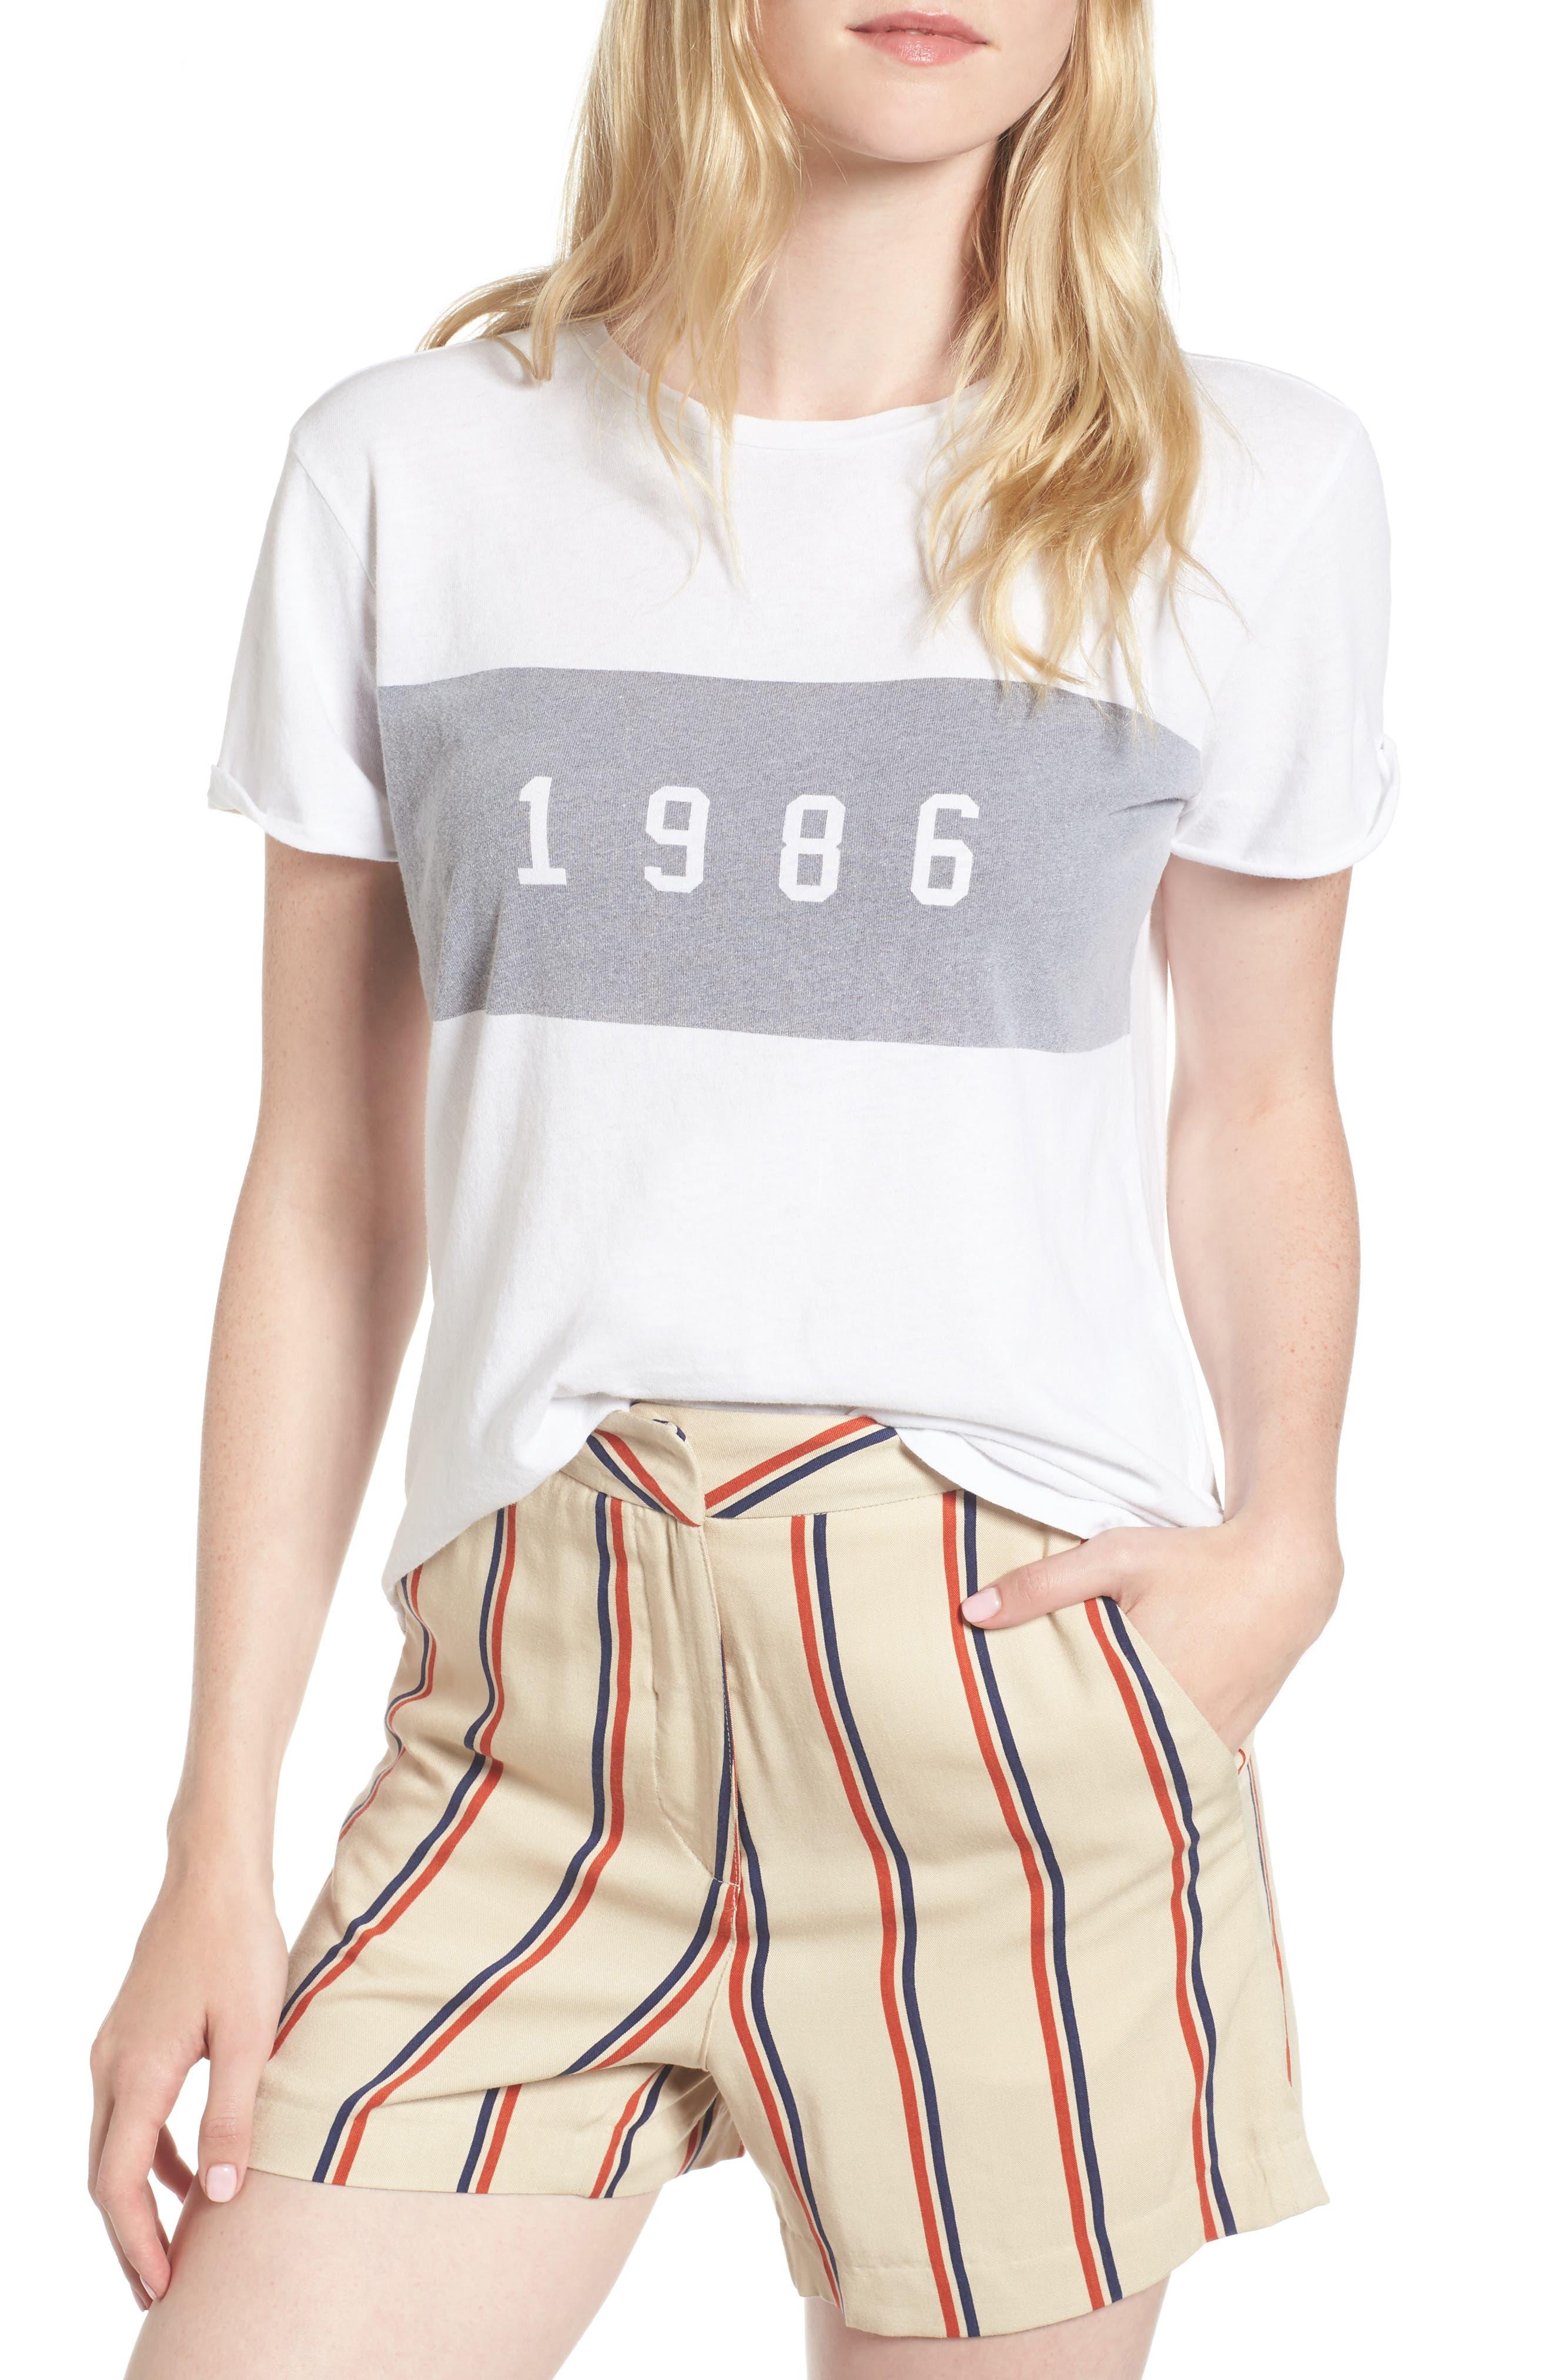 1986 Tee,                         Main,                         color,